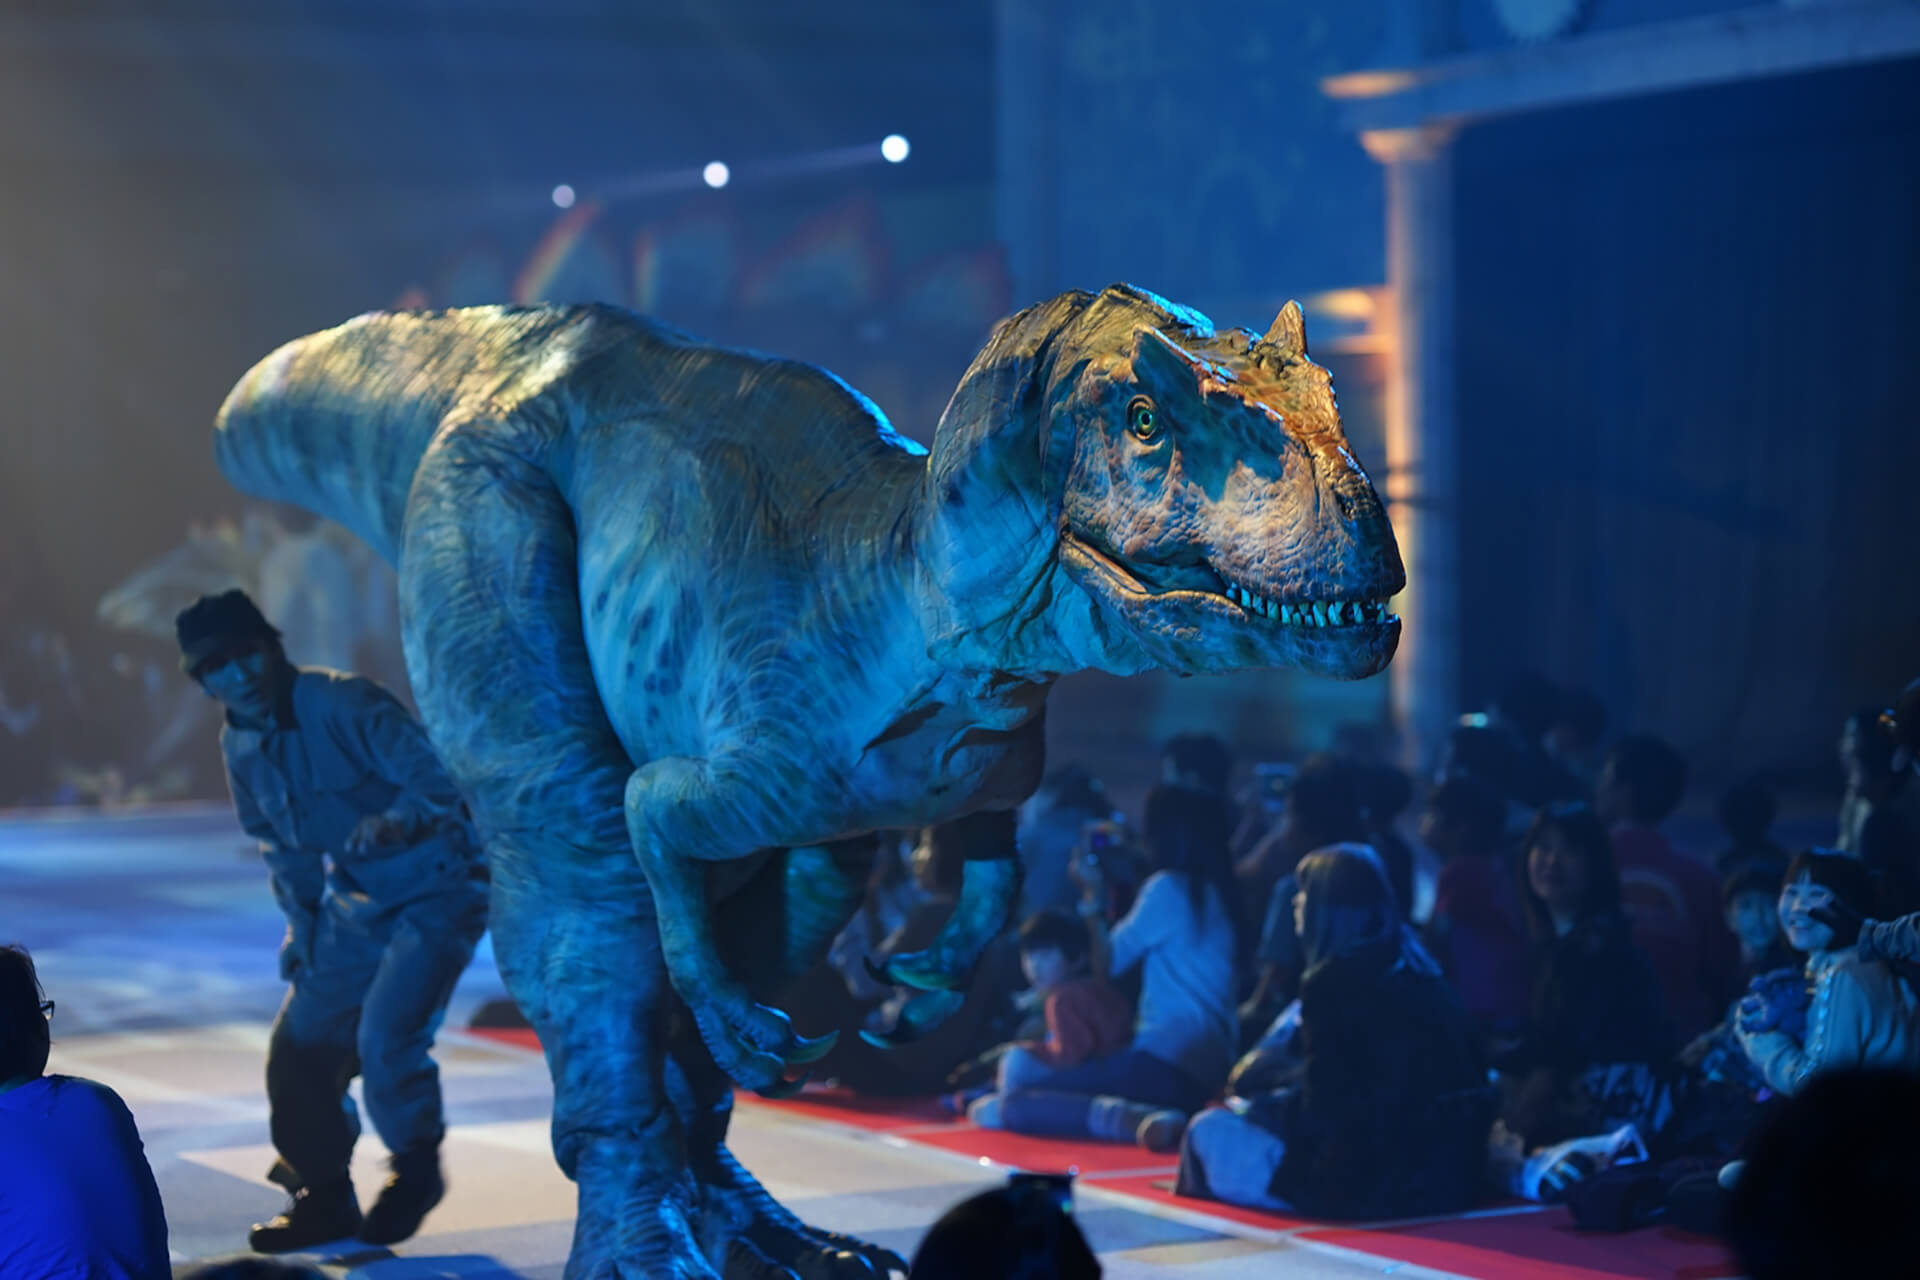 、「DINO-A-LIVE『不思議な恐竜博物館』 in TACHIKAWA」